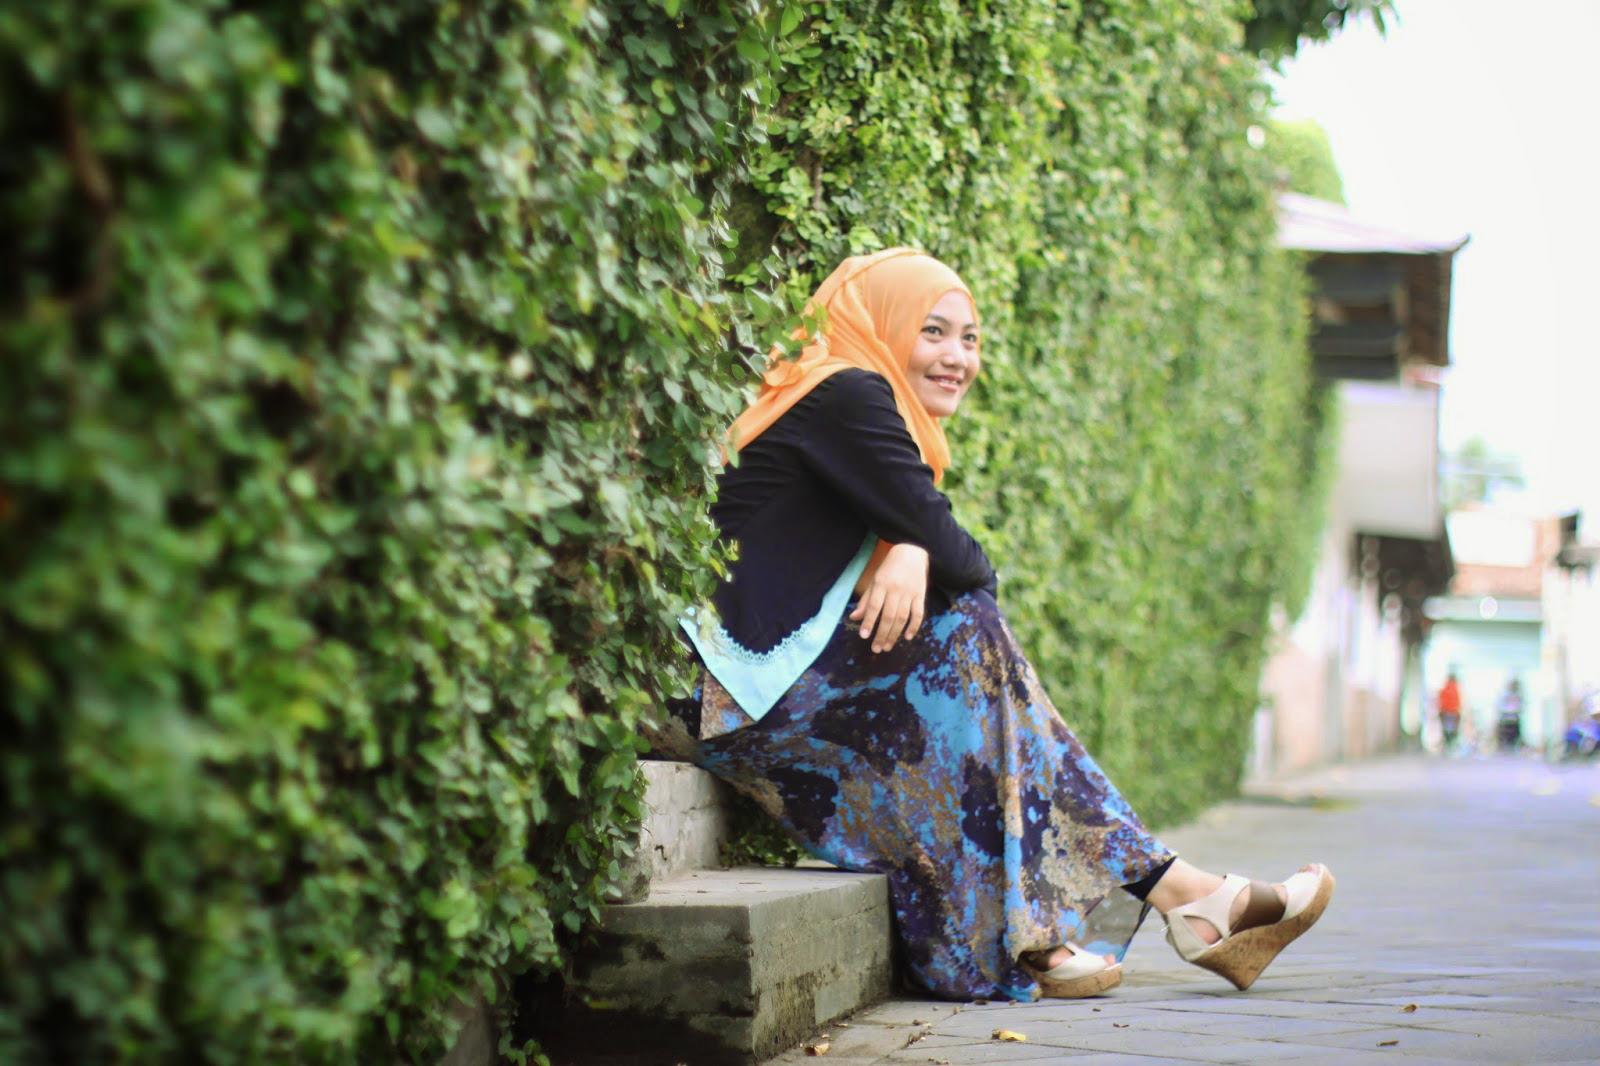 5 hijab Cewek IGO Efrida Yantiers cilik 5 hijab Cewek IGO Efrida Yantis for £10 5 hijab Cewek IGO Efrida Yanti styles for silky scarves gta 5 hijab Cewek IGO Efrida Yanti